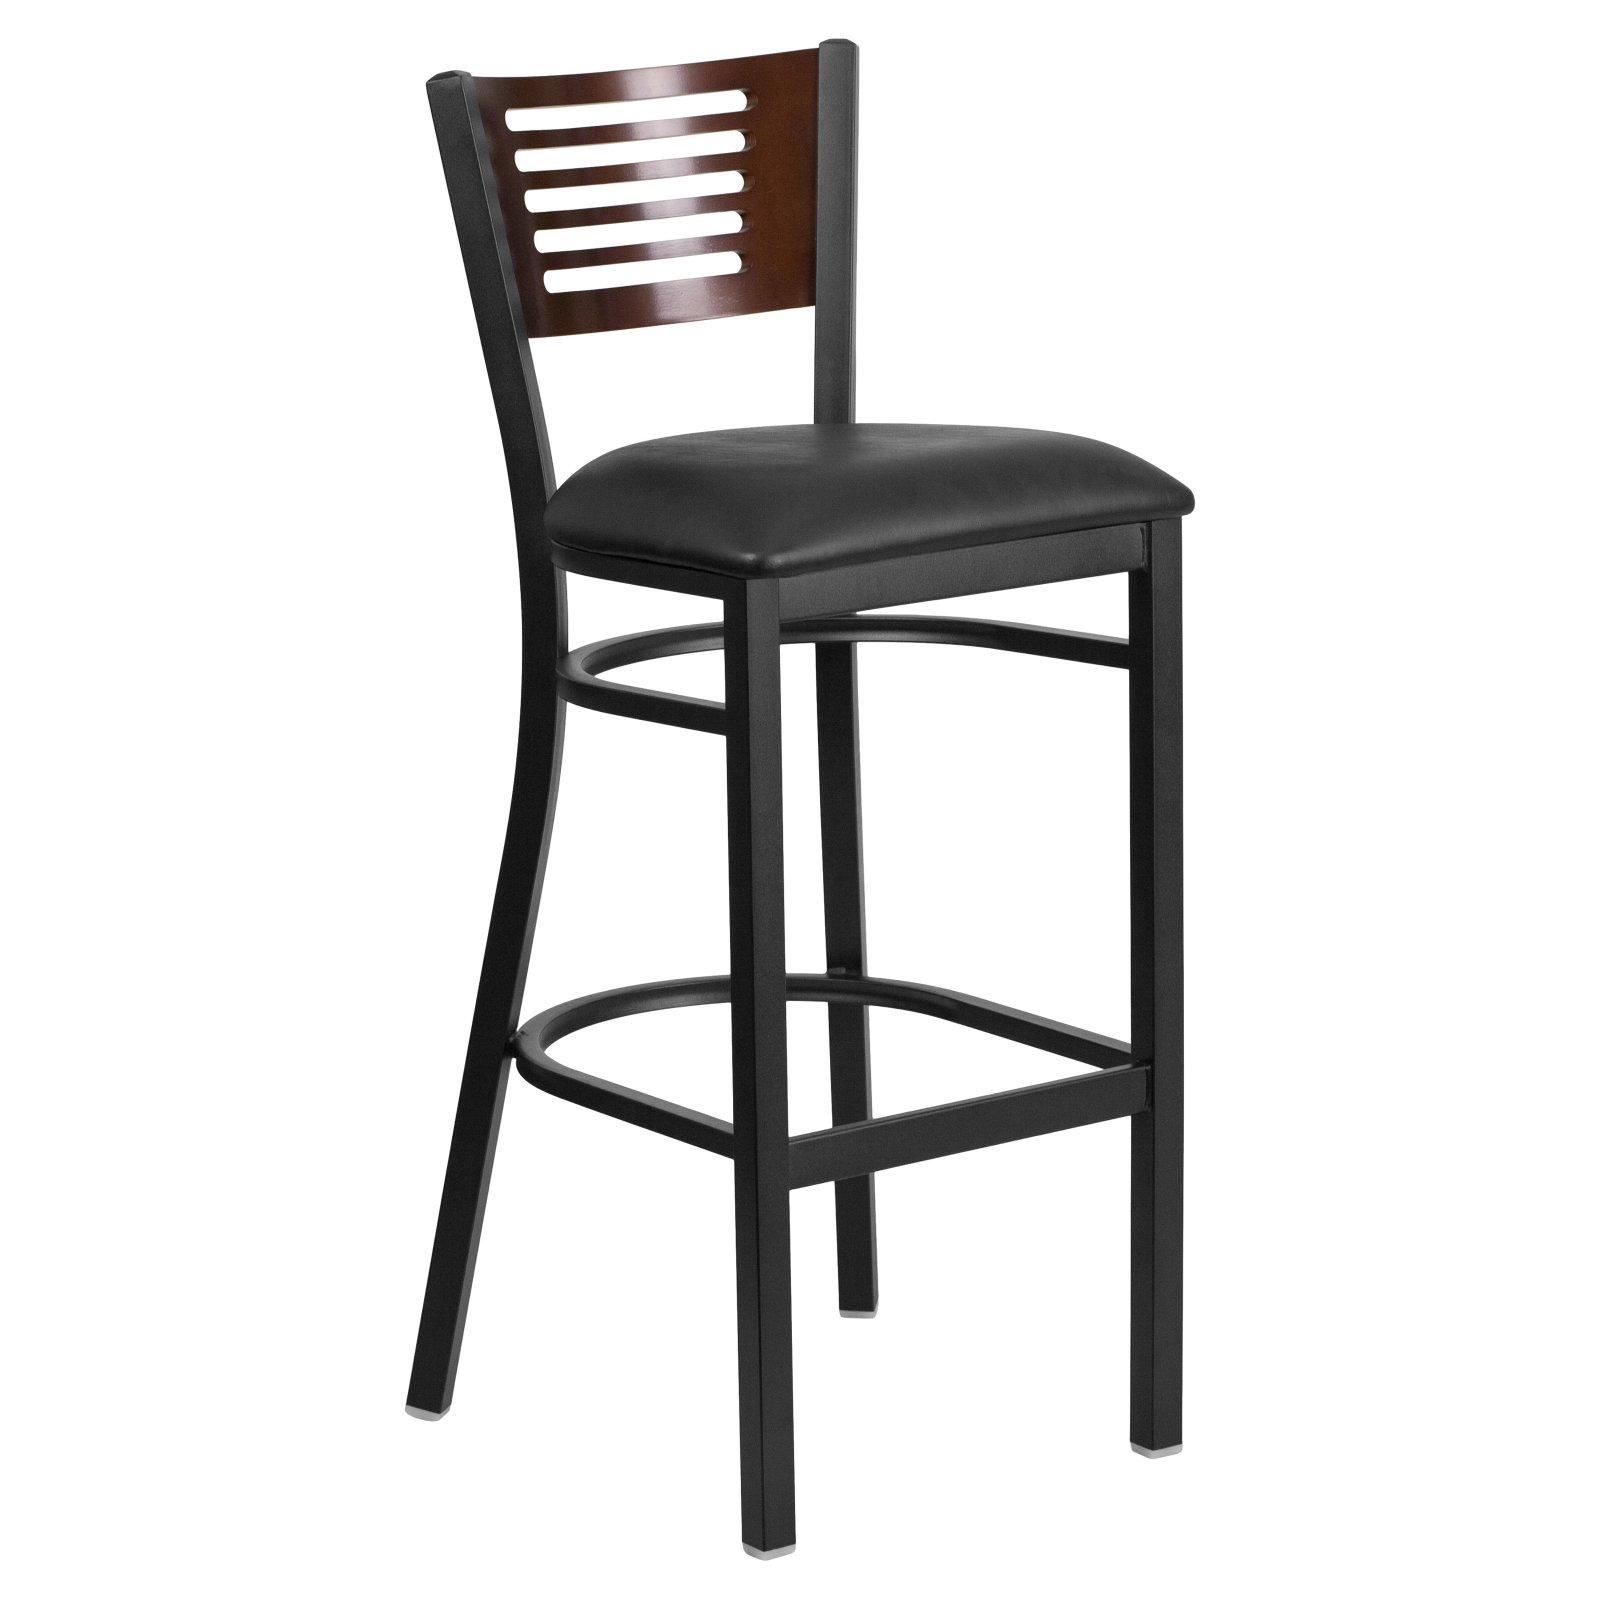 Flash Furniture HERCULES Series Black Decorative Slat Back Metal Restaurant Barstool, Wood Back, Vinyl Seat, Multiple Colors